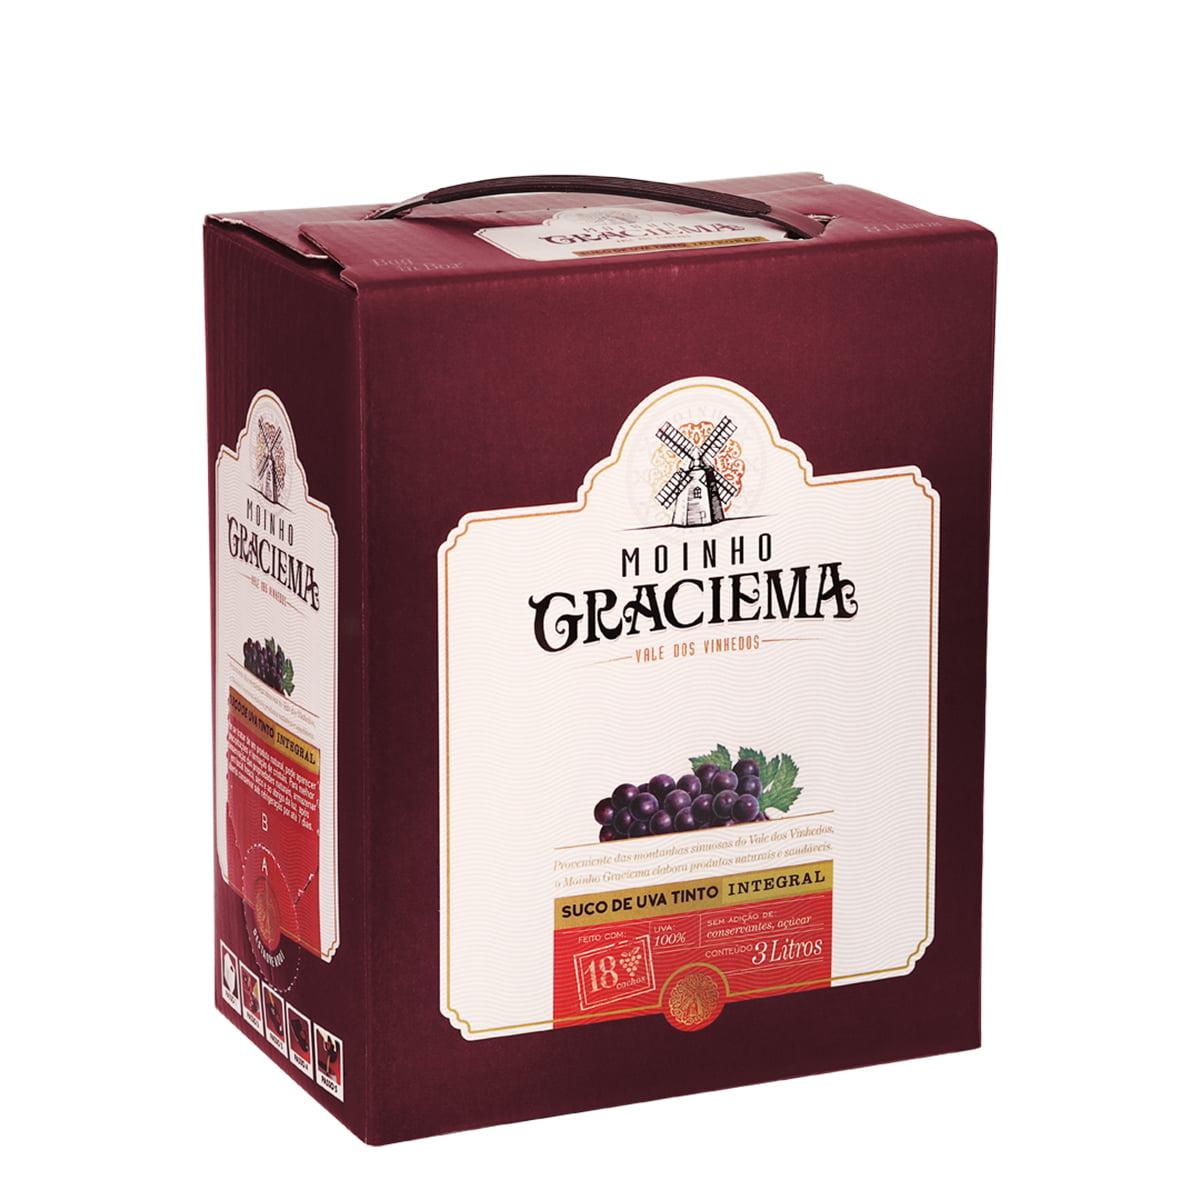 Suco de Uva Moinho Graciema Tinto Integral Bag in Box 3Lts